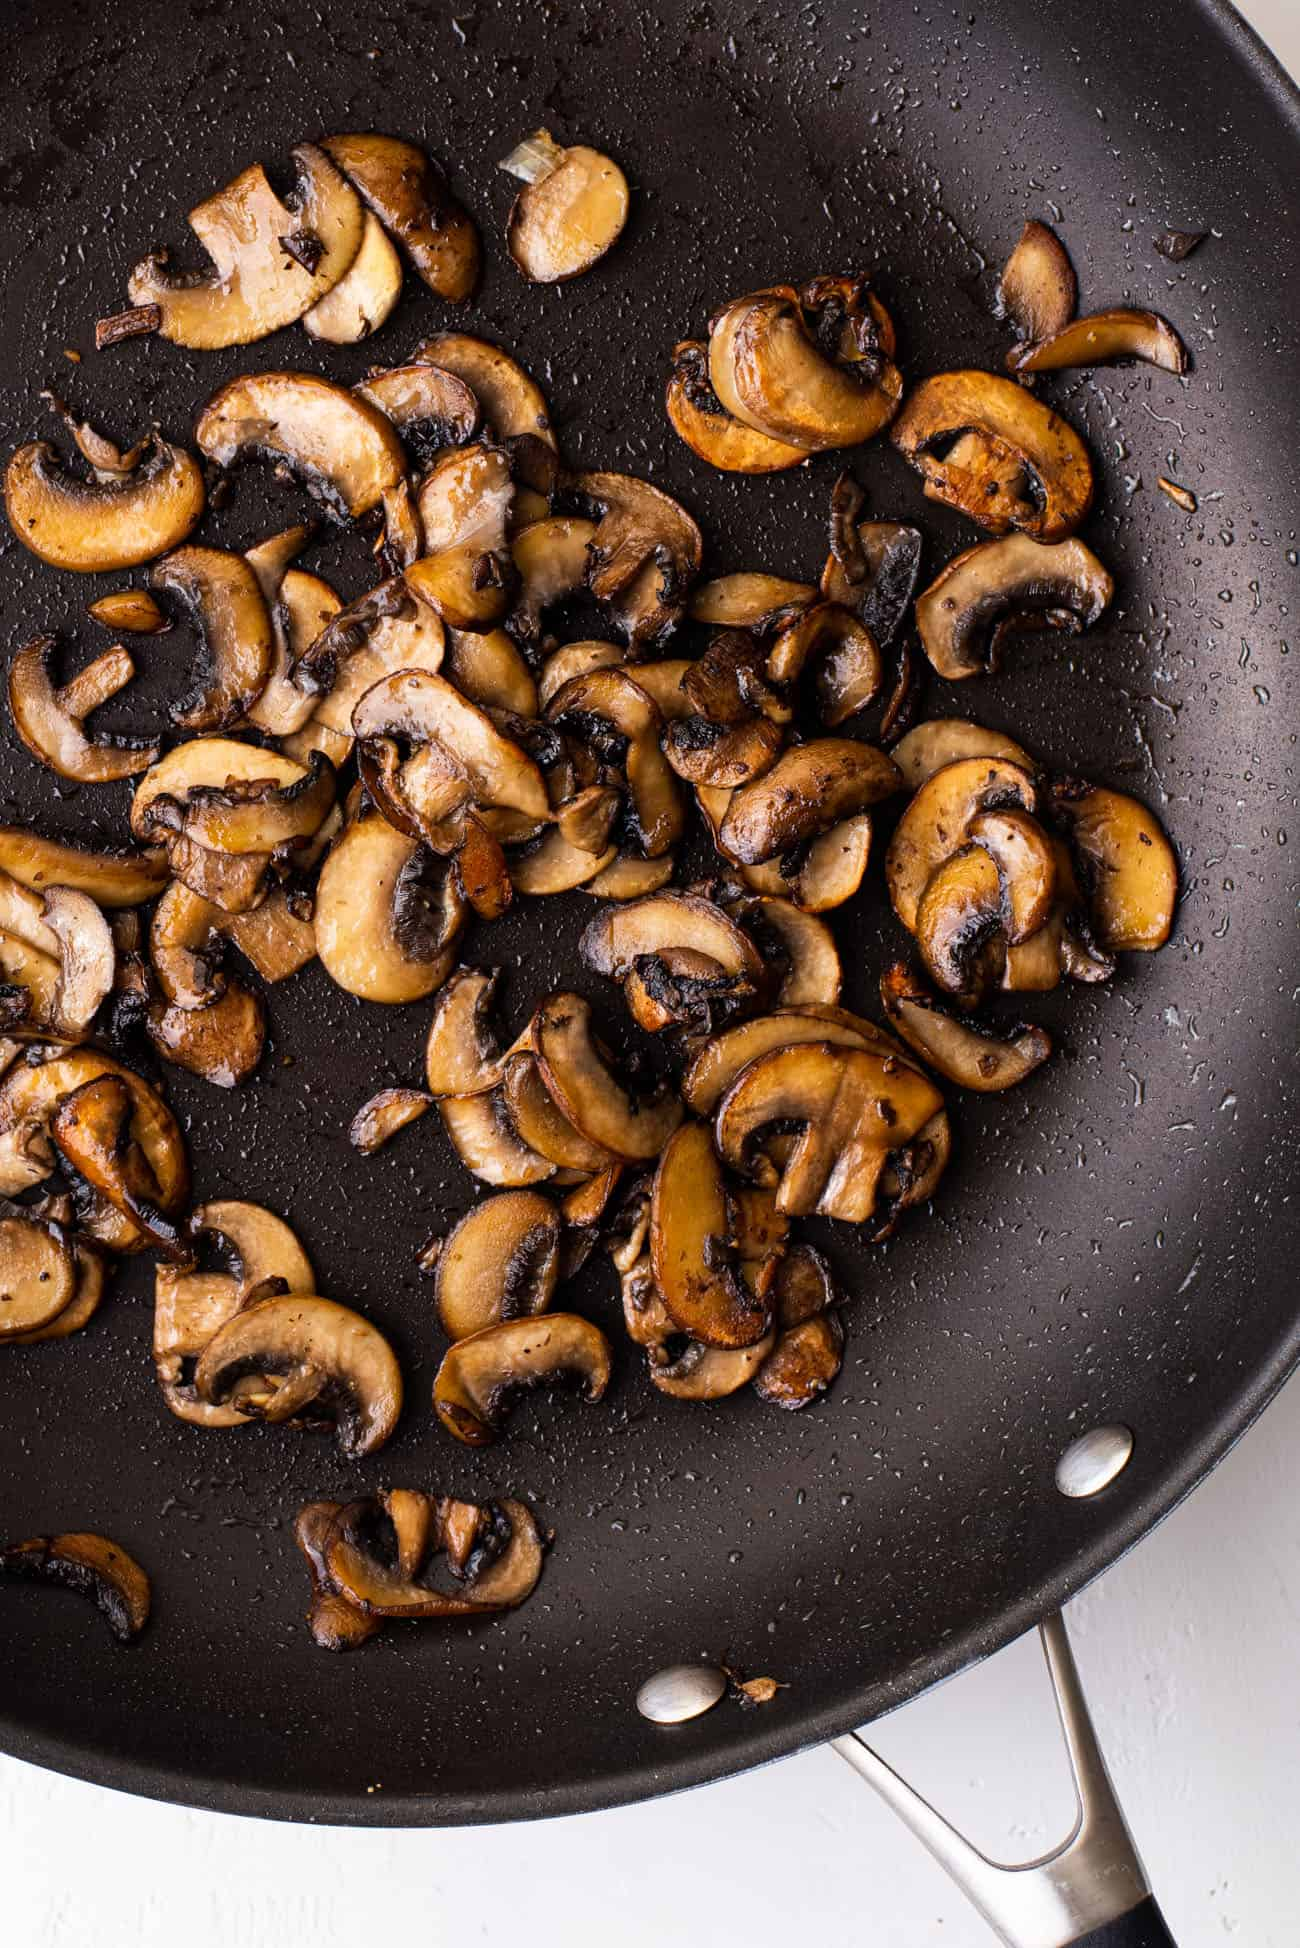 Sautéed cremini mushrooms in a skillet